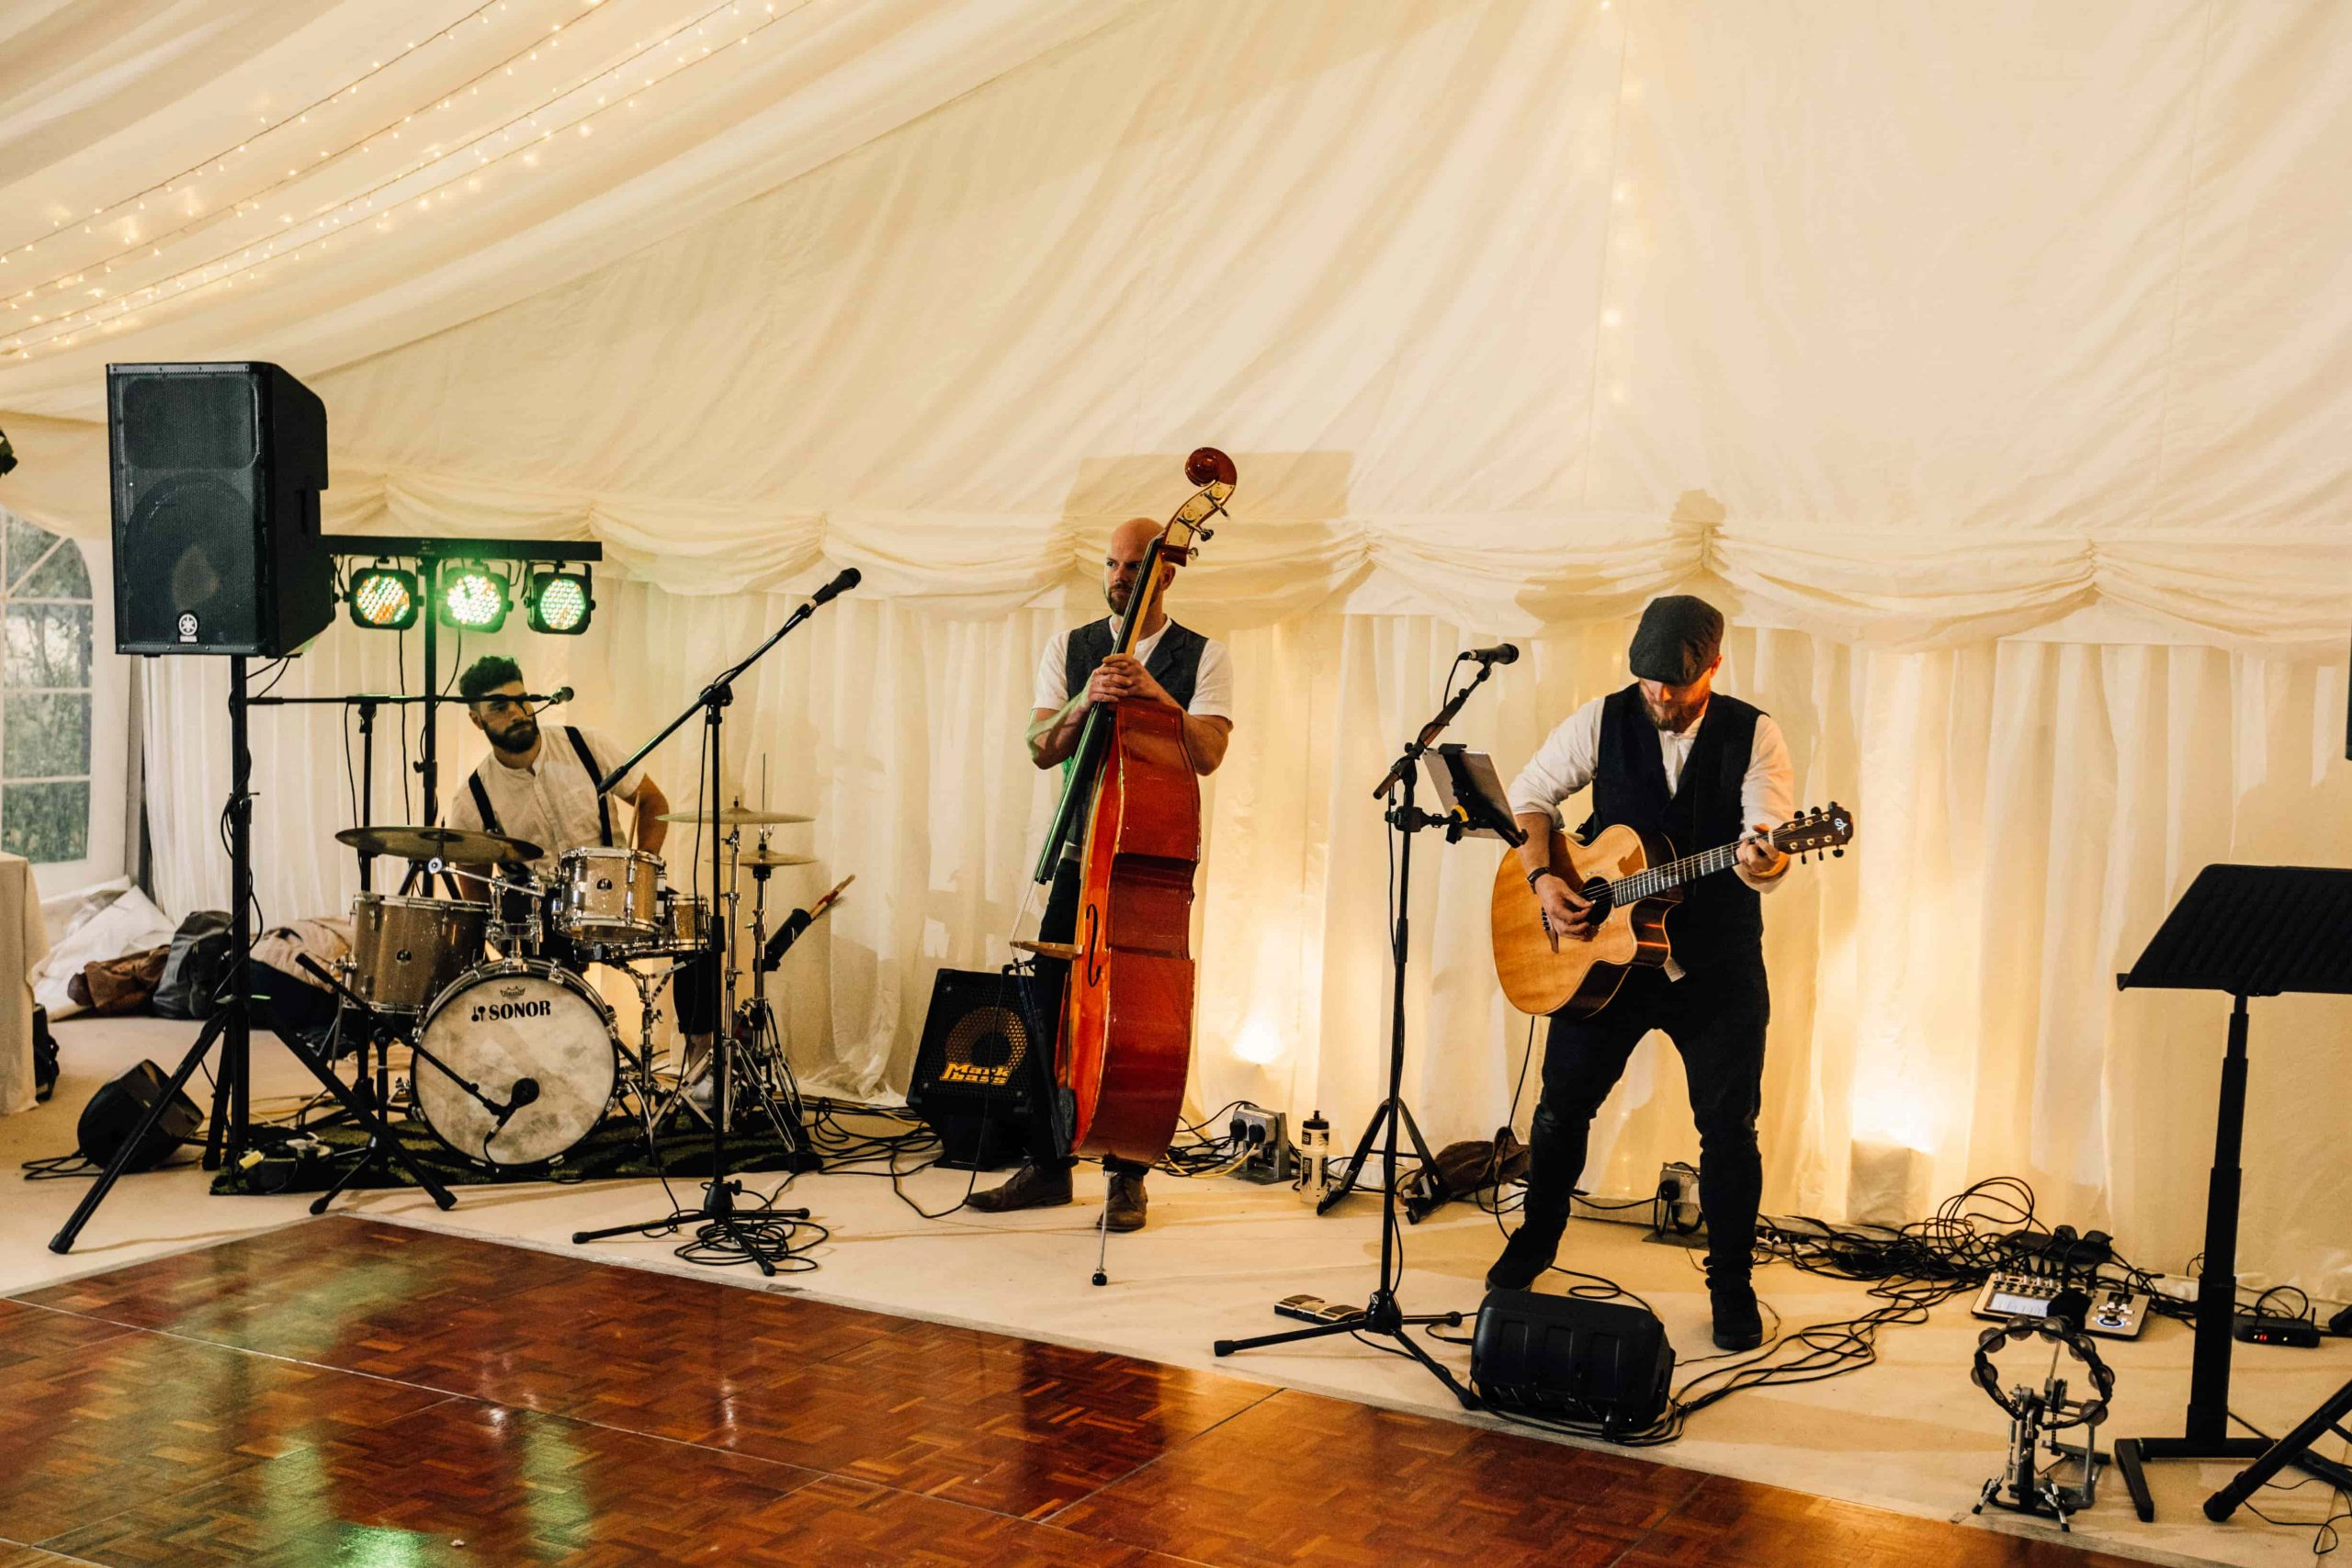 The Wildermen band sound check